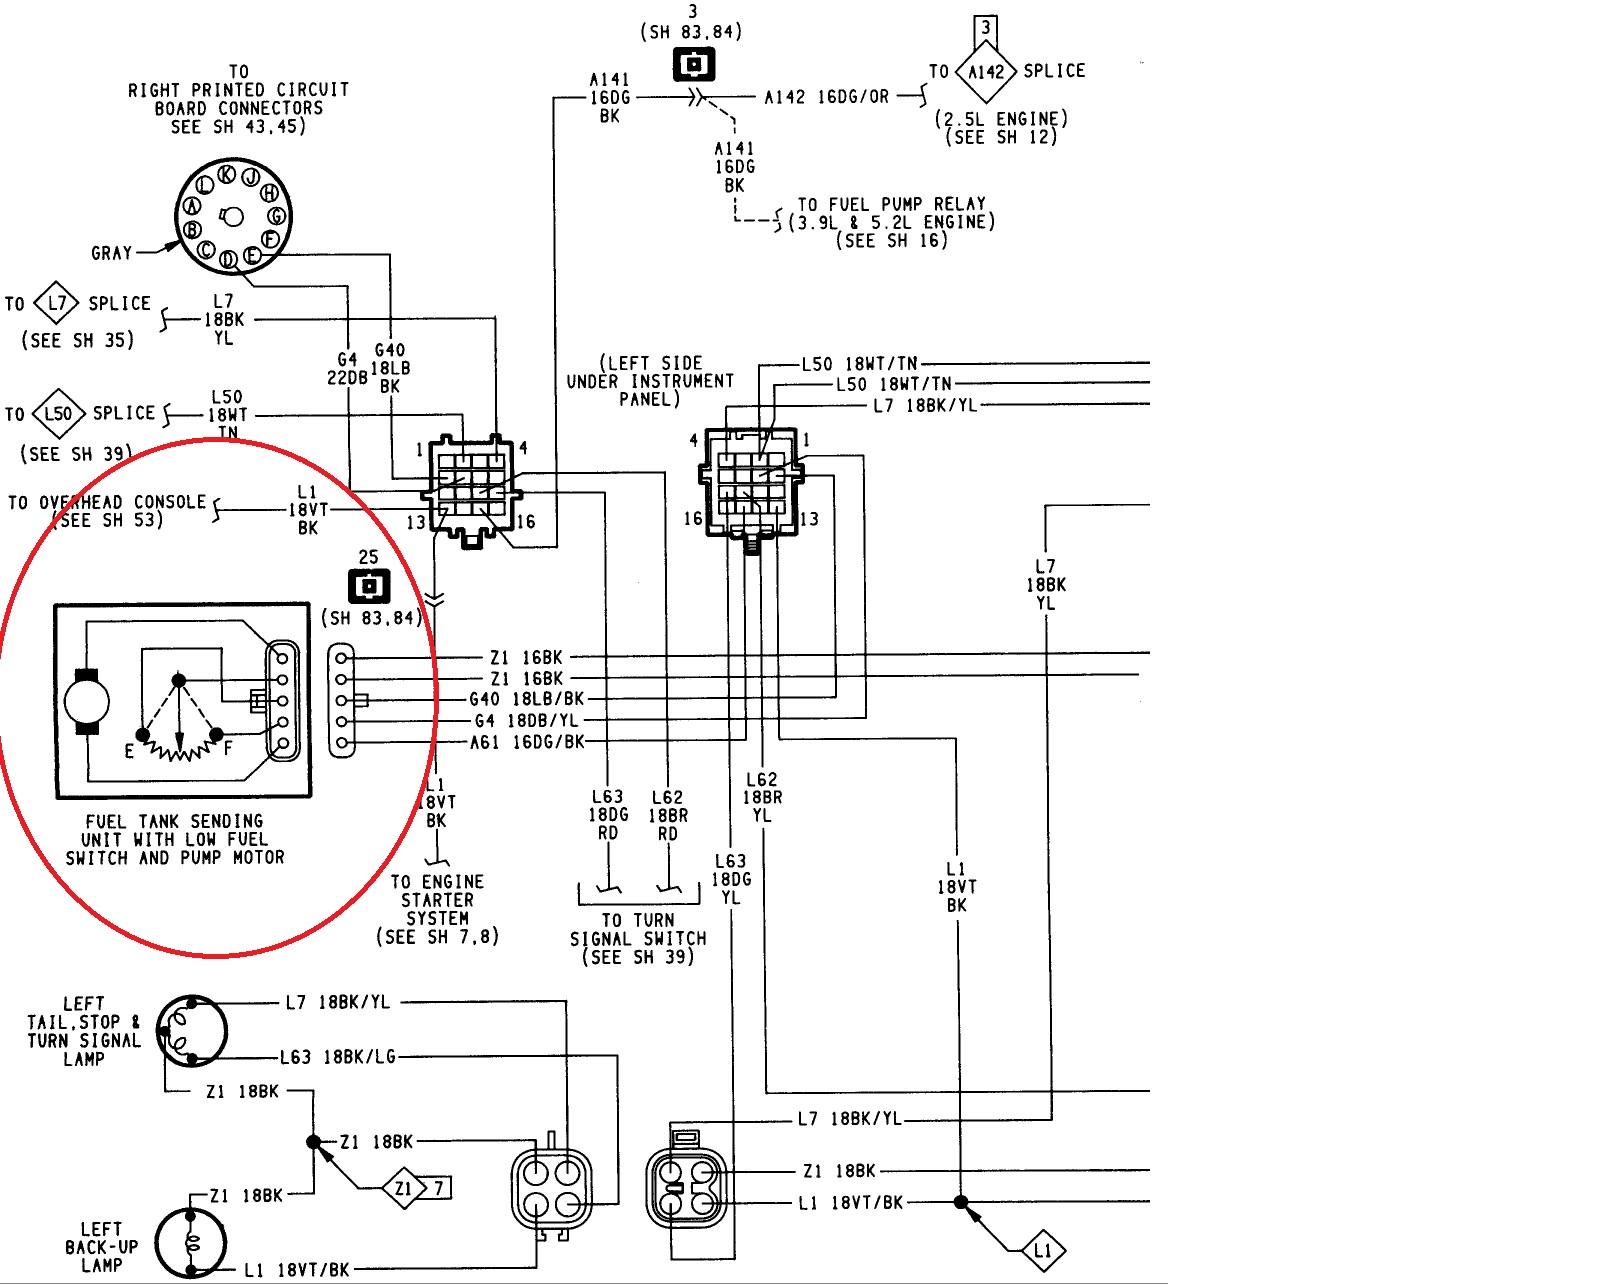 2000 Dodge Dakota Wiring Diagram solved 2013 Of 2000 Dodge Dakota Wiring Diagram